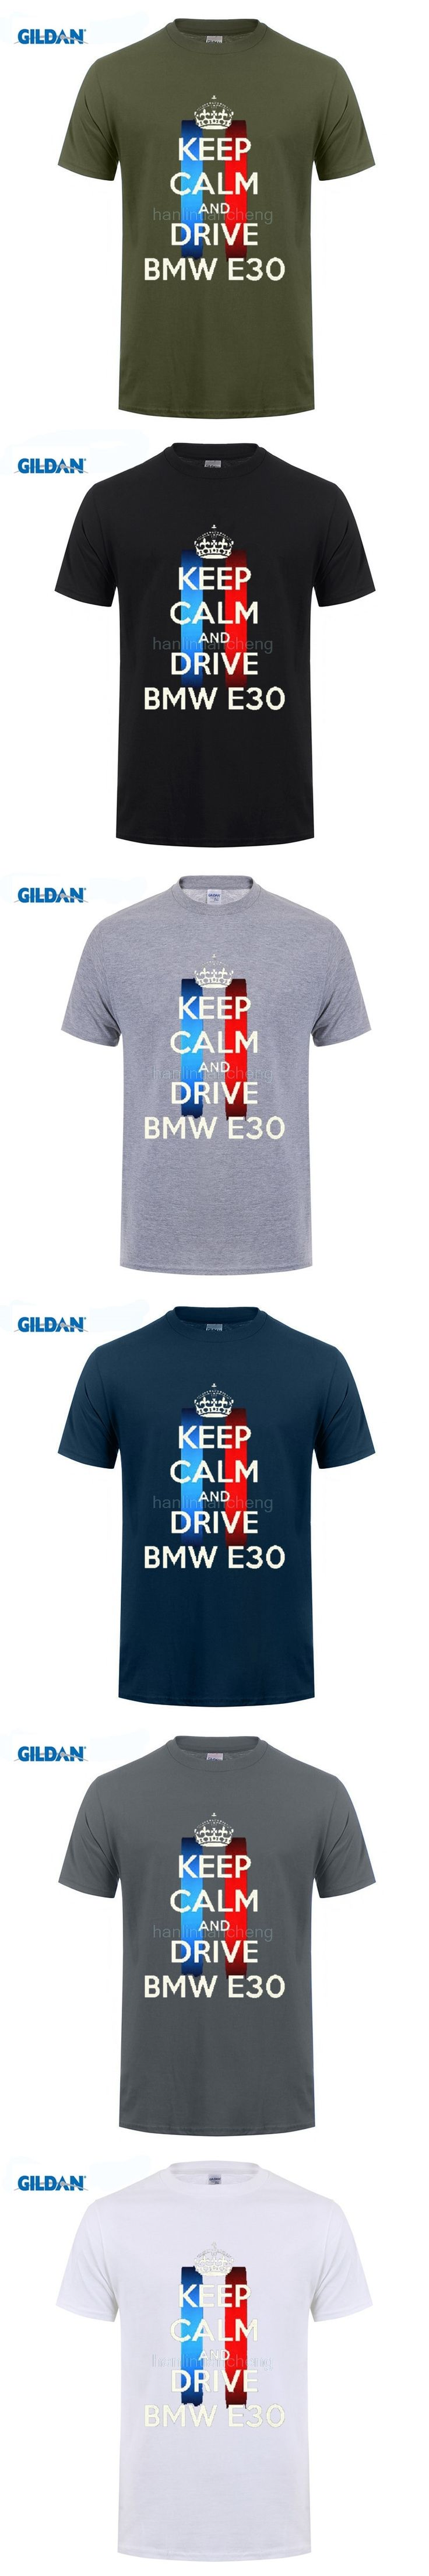 GILDAN 100% Cotton O-Neck customised T-shirt  New Keep Calm and Drive a BMW X5 M3 M5 Funny Men's Black T Shirts